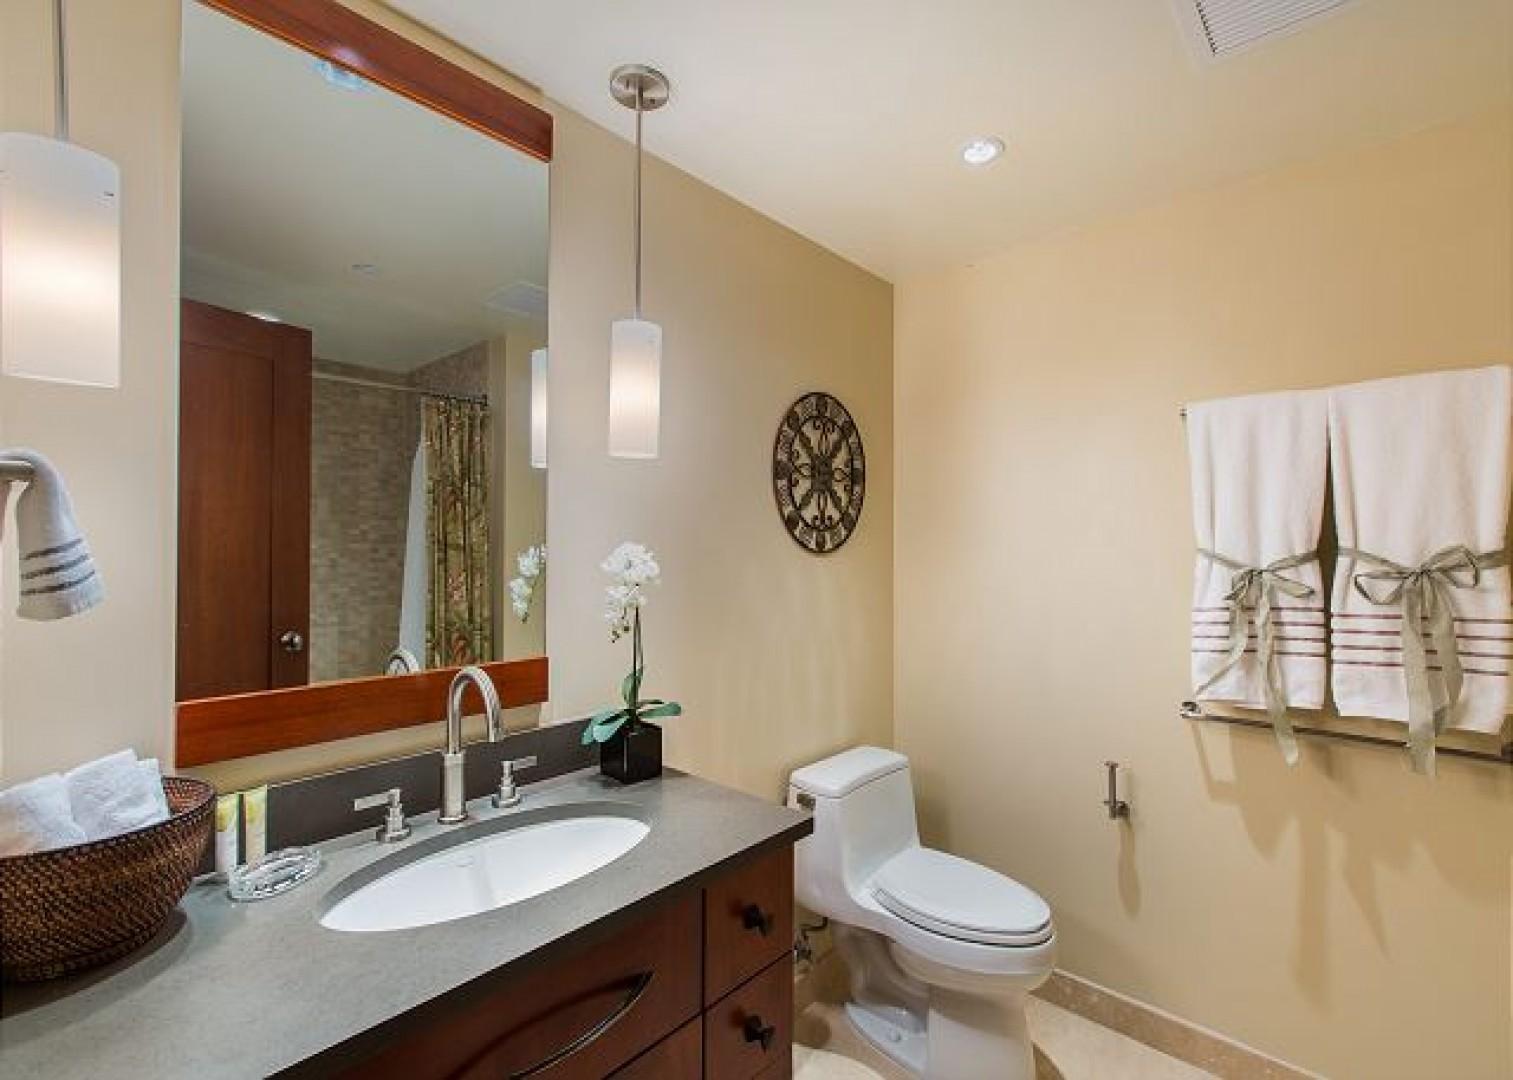 2nd Bathroom has combination shower/tub